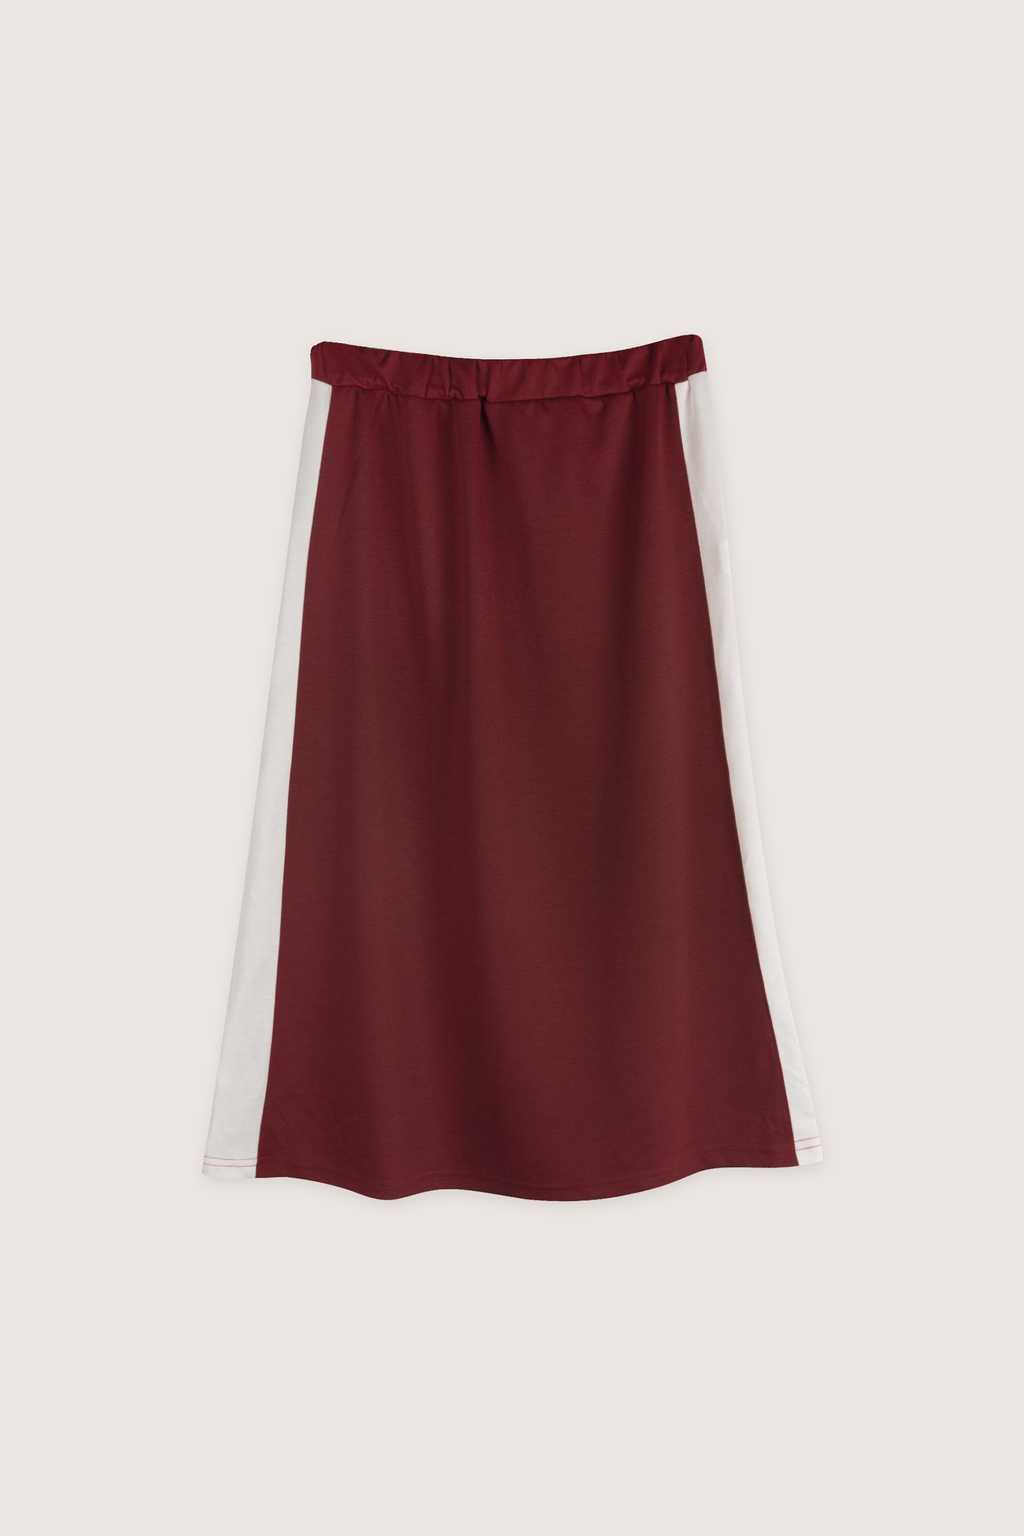 Skirt H166 Wine 5